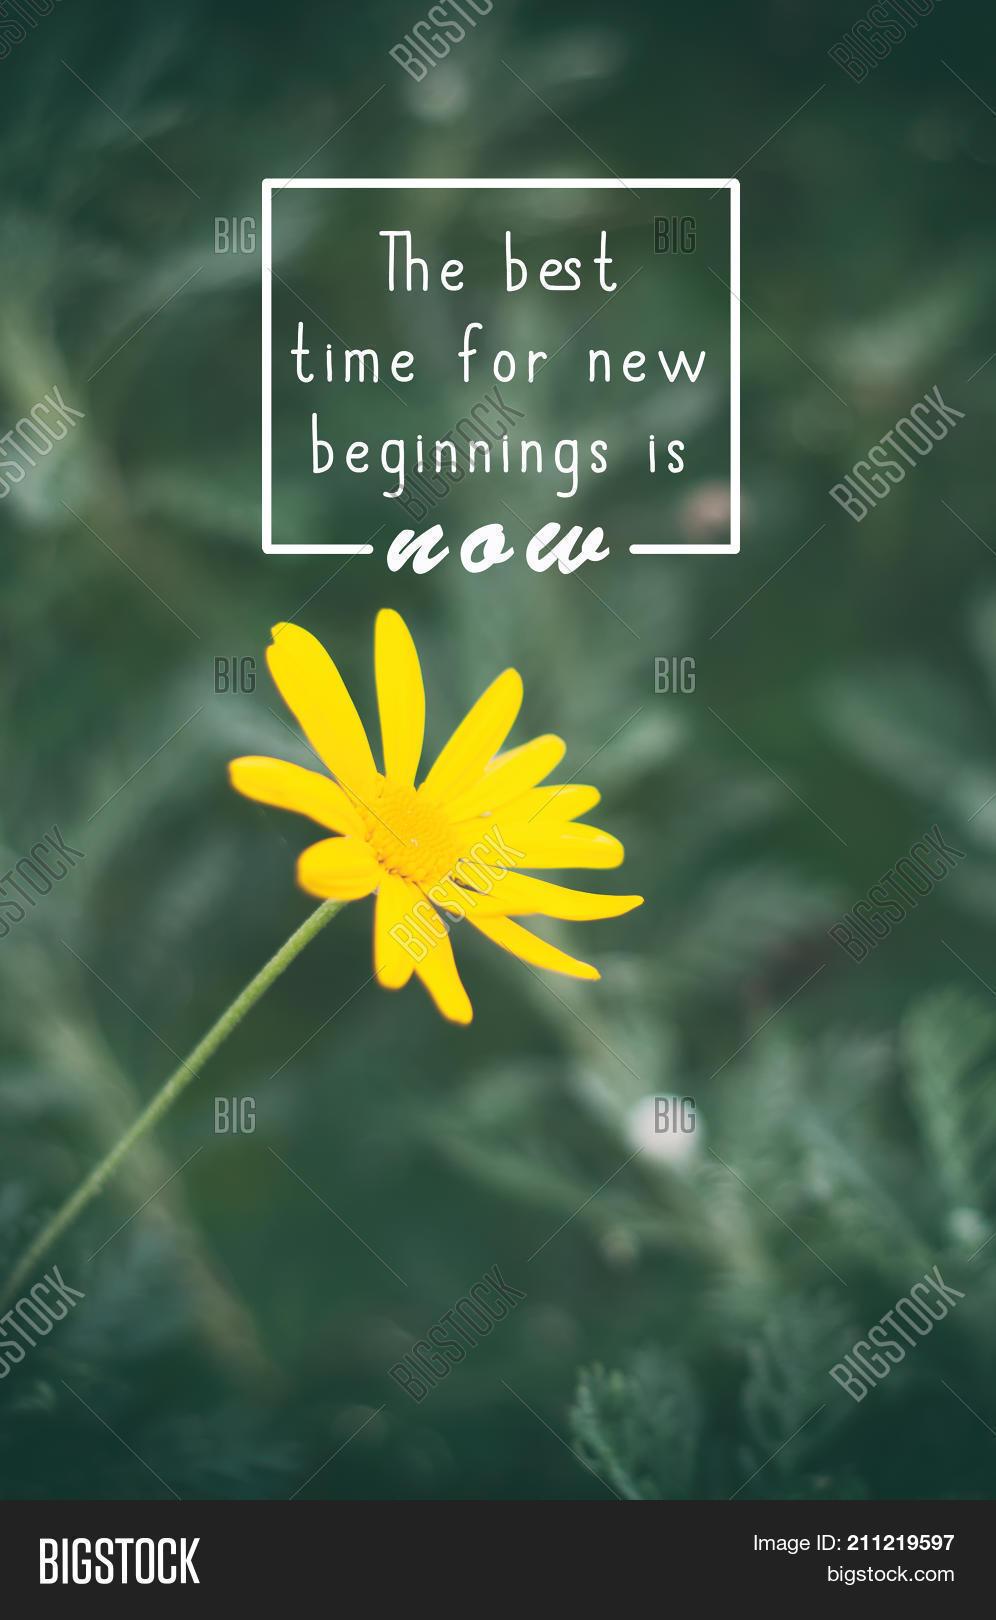 Life Inspirational Image Photo Free Trial Bigstock